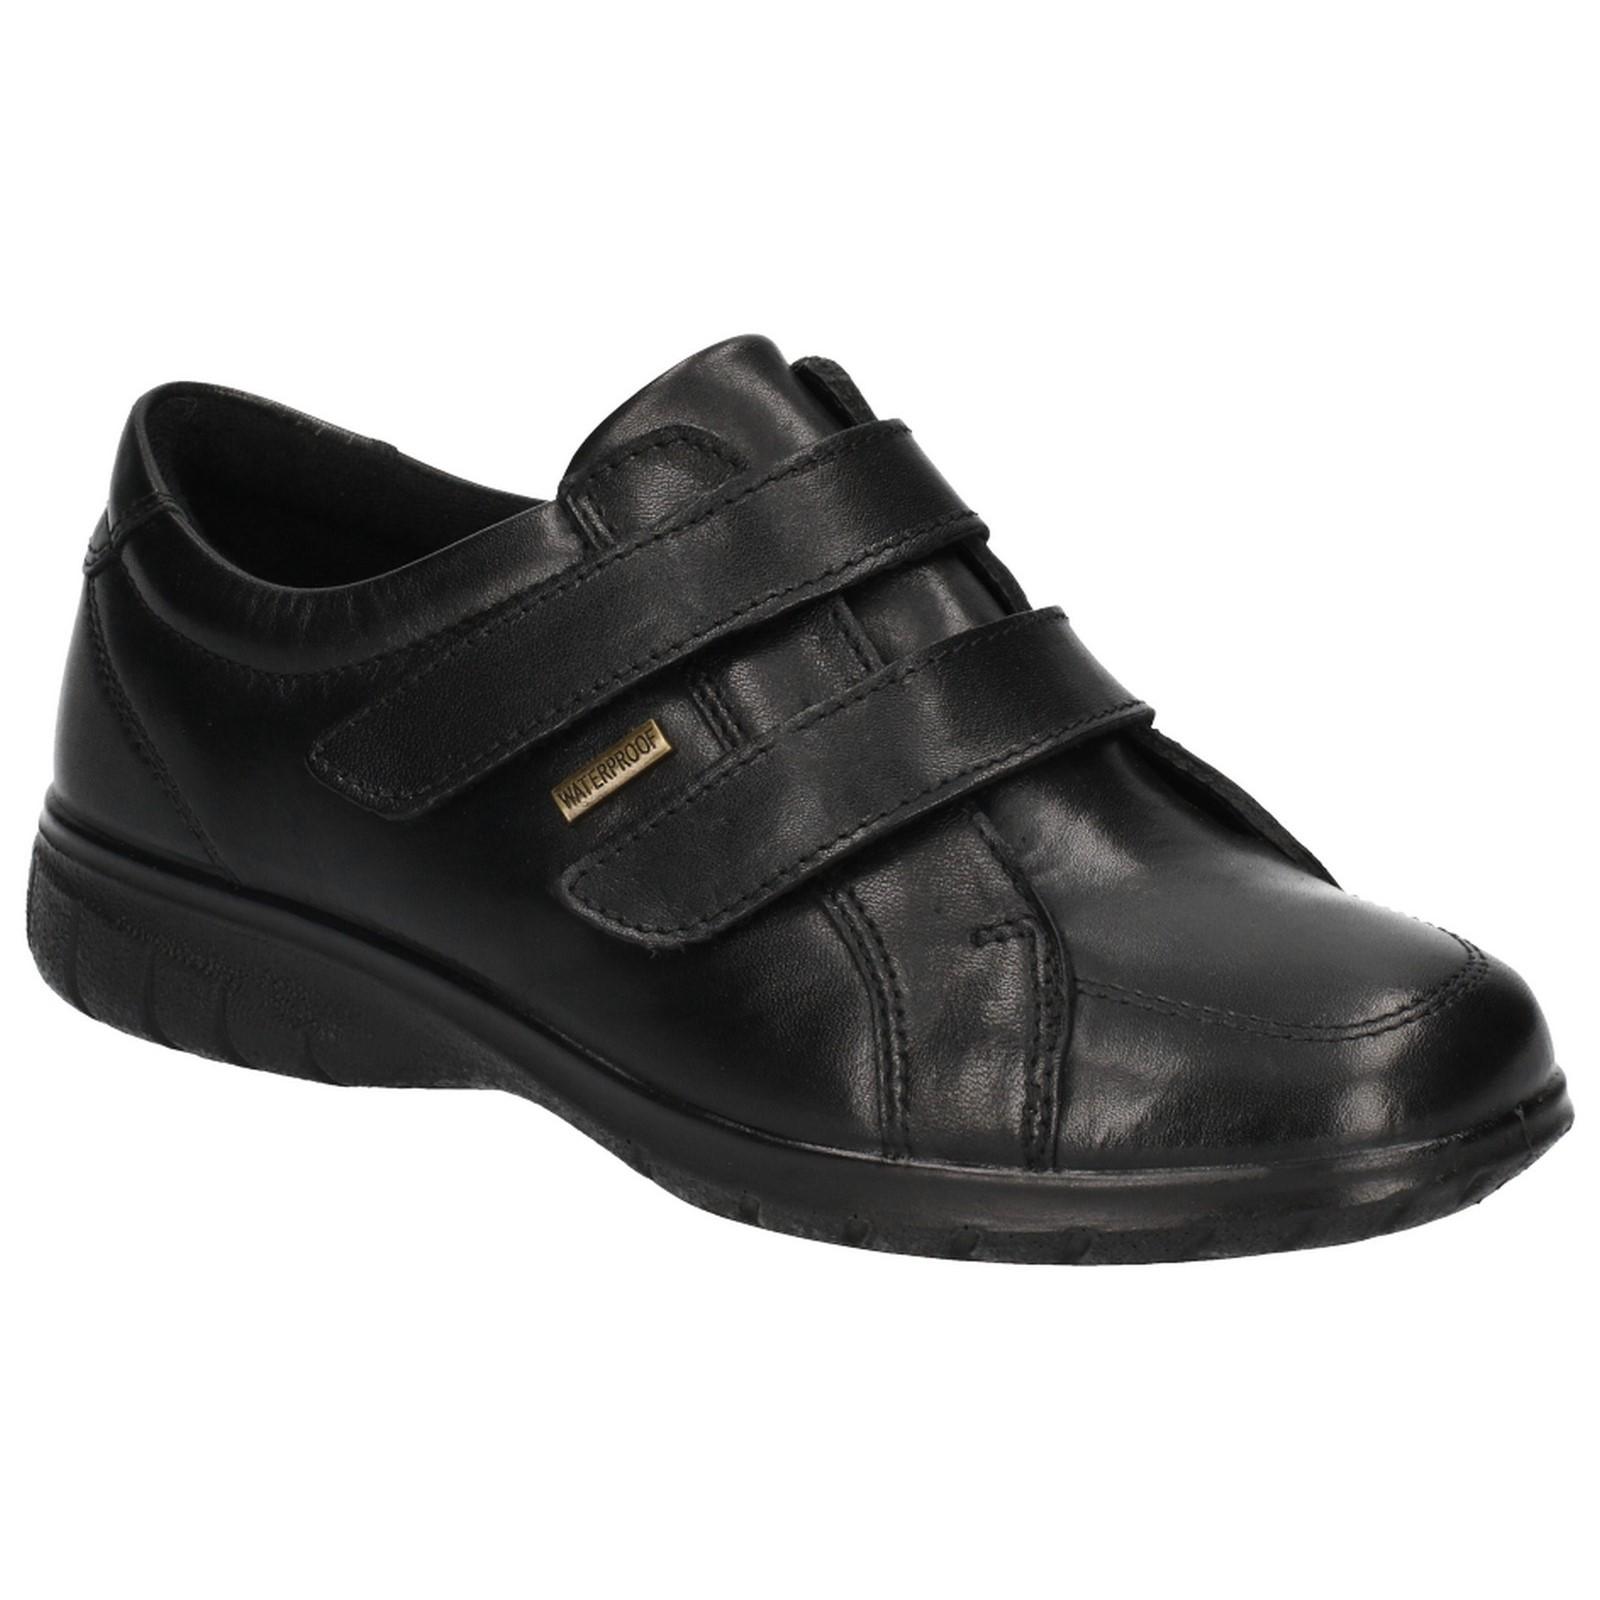 Cotswold Femmes Haythrop Difficile Fermeture Chaussure